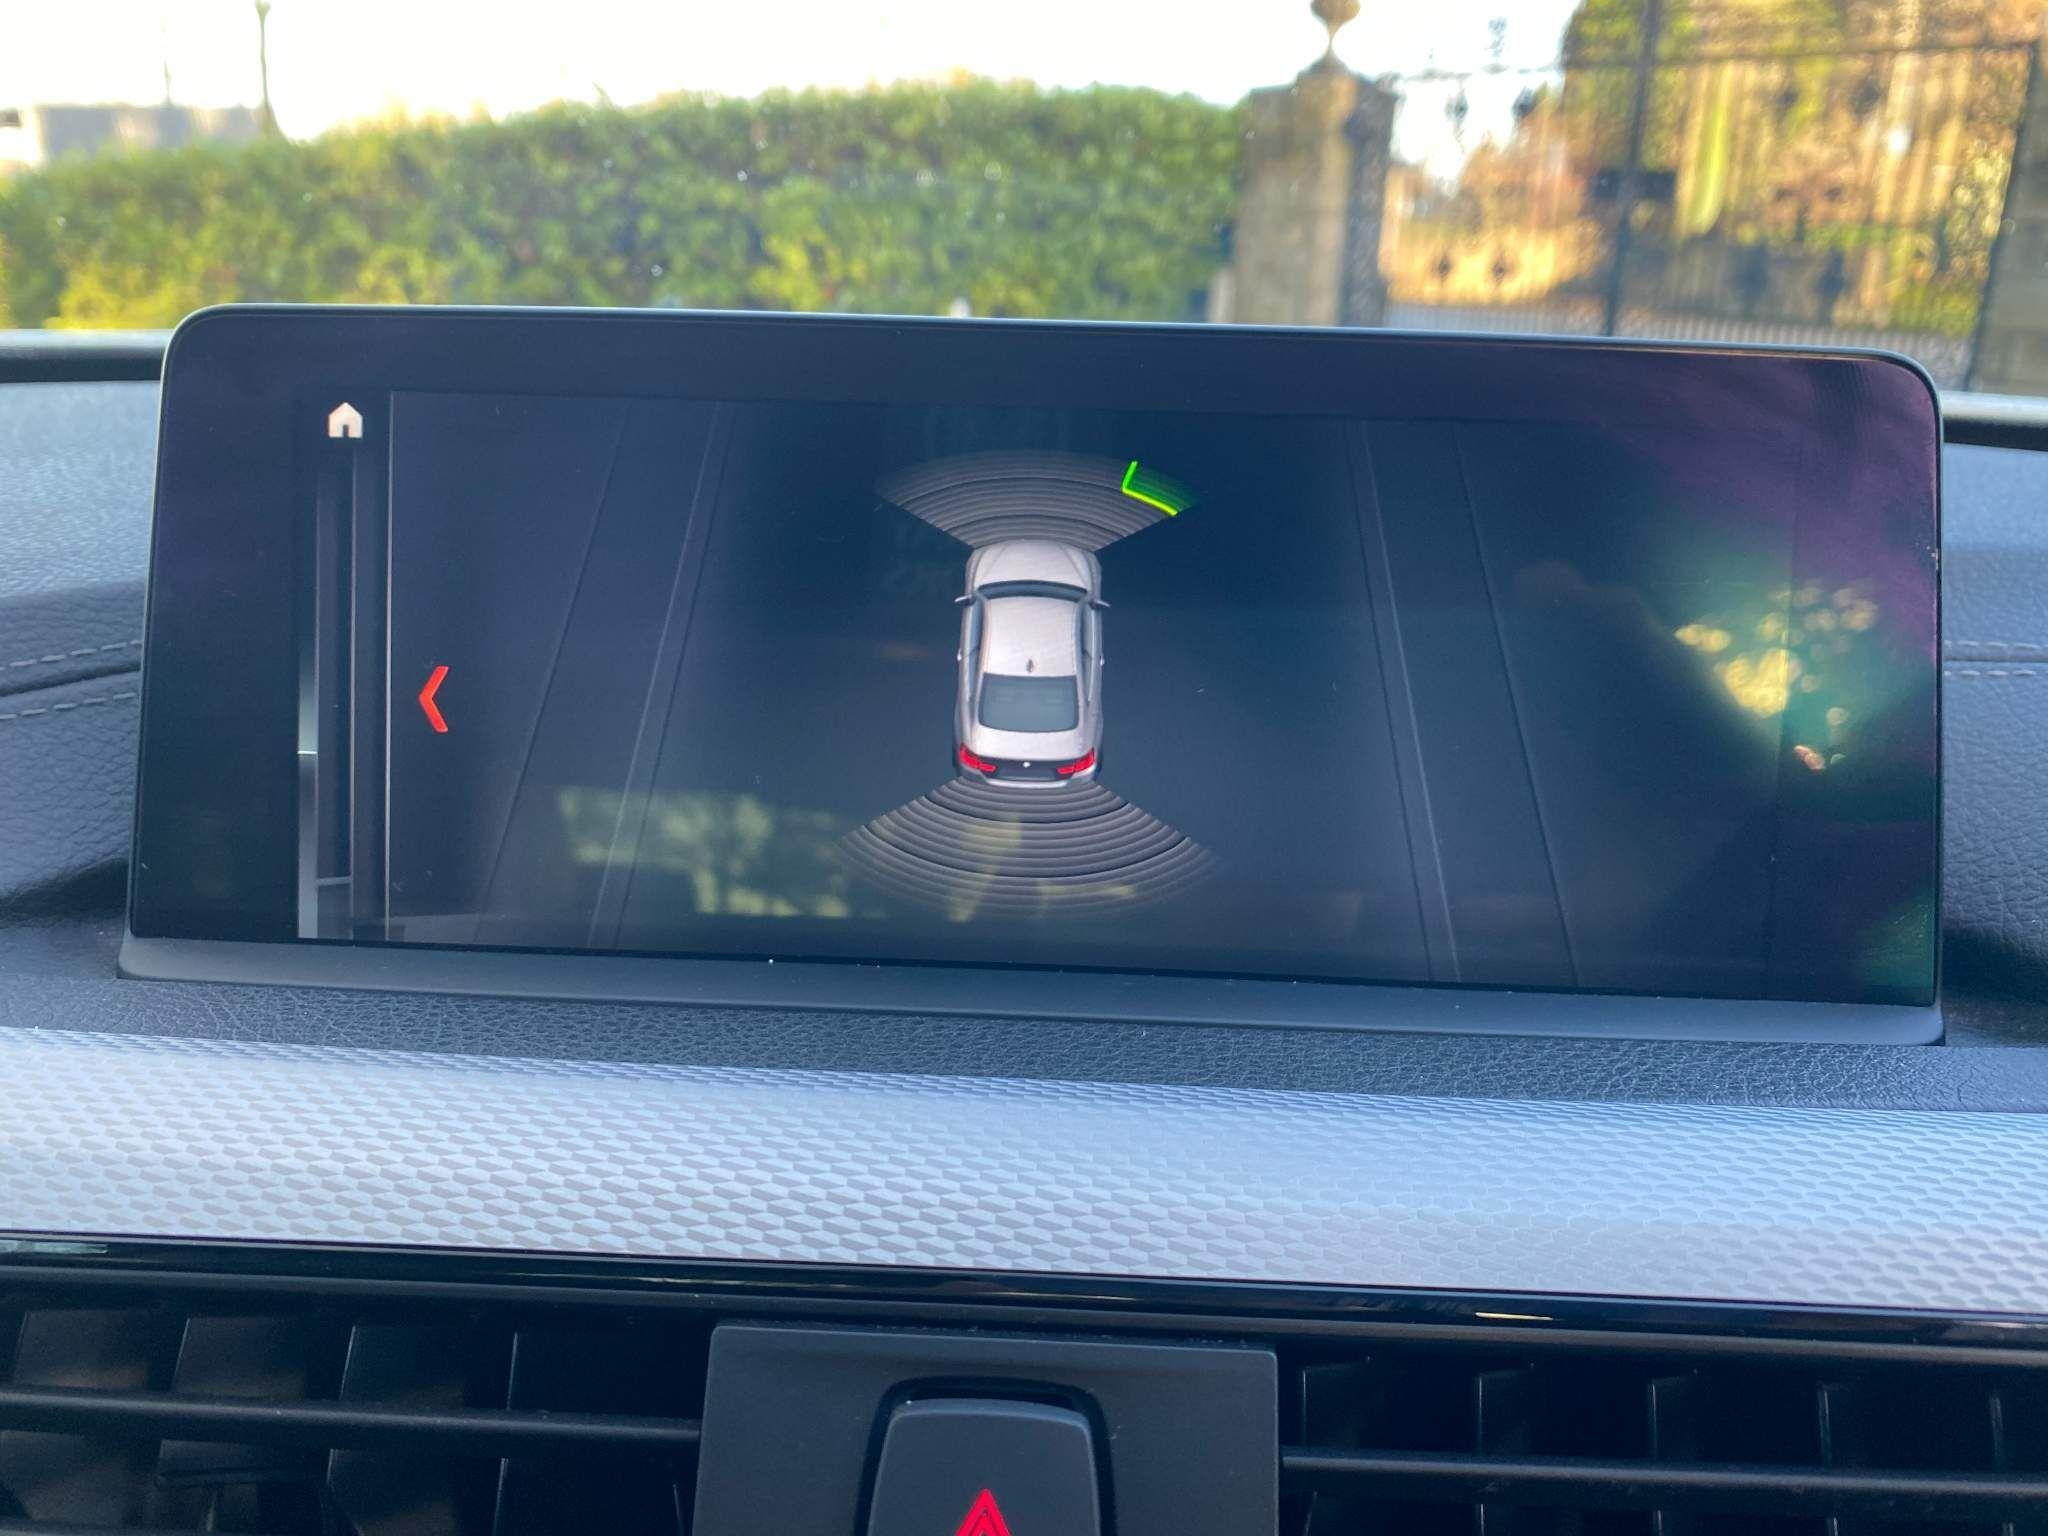 2018 BMW 4 Series 2.0 420d M Sport Auto (s/s) 2dr Diesel Automatic – Moyway Motors Dungannon full